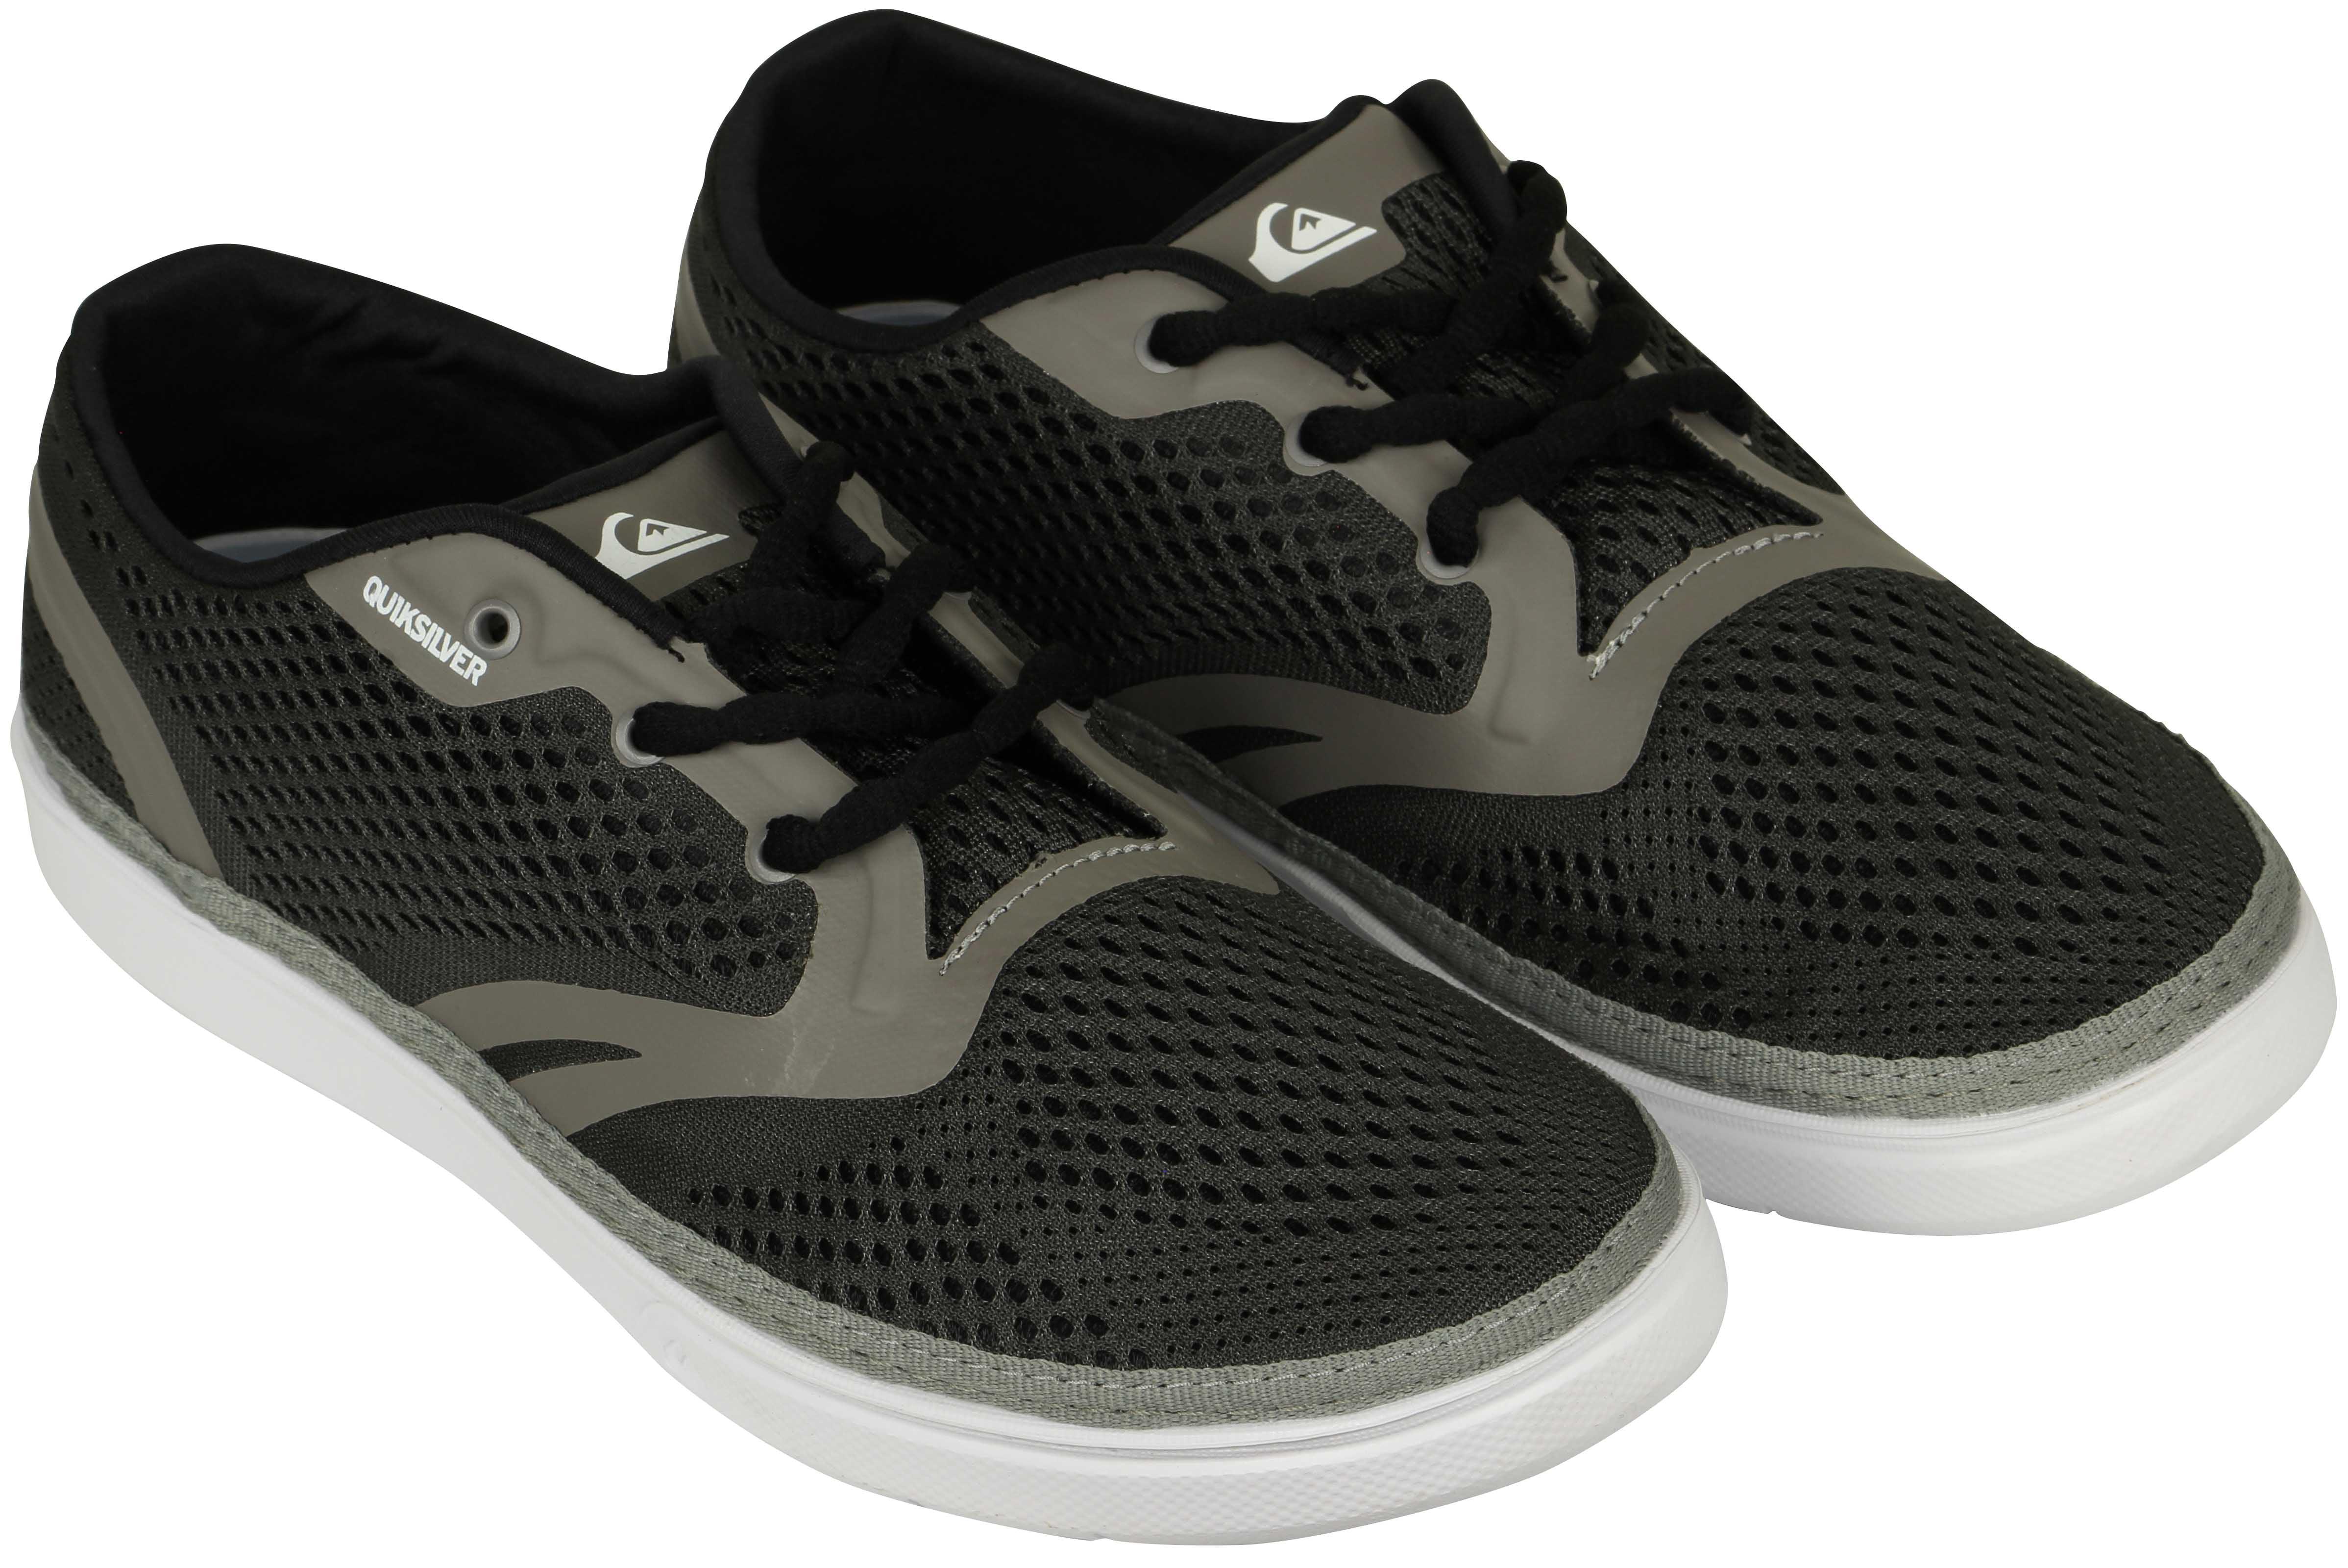 Quiksilver Mens Oceanside Shoe